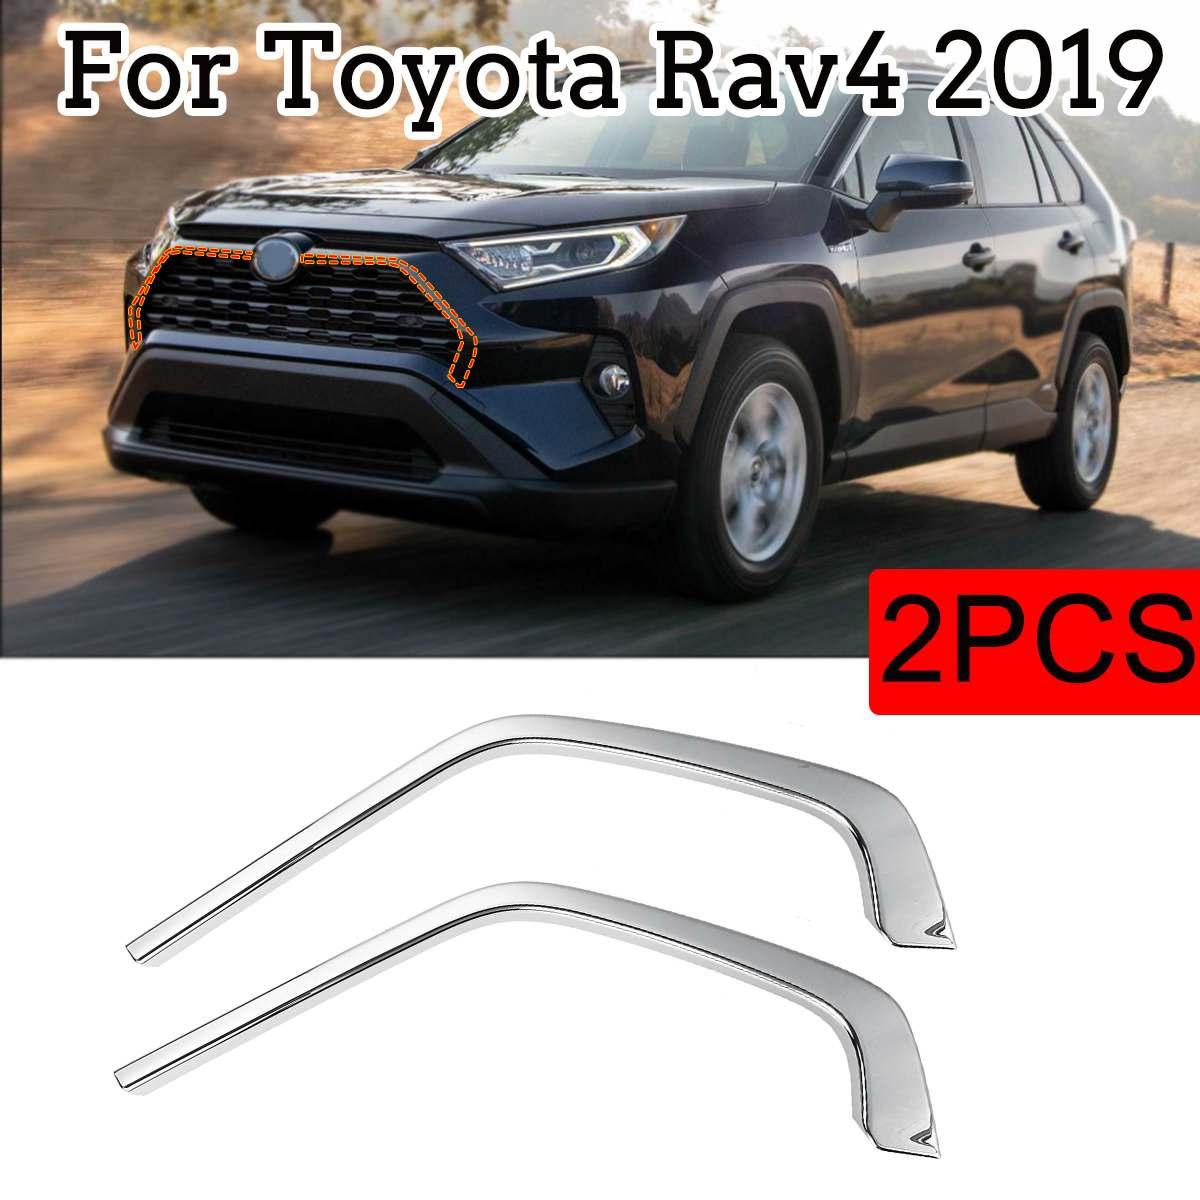 2X Chrome Styling Door Mirror Cover Trim For Toyota RAV4 2019